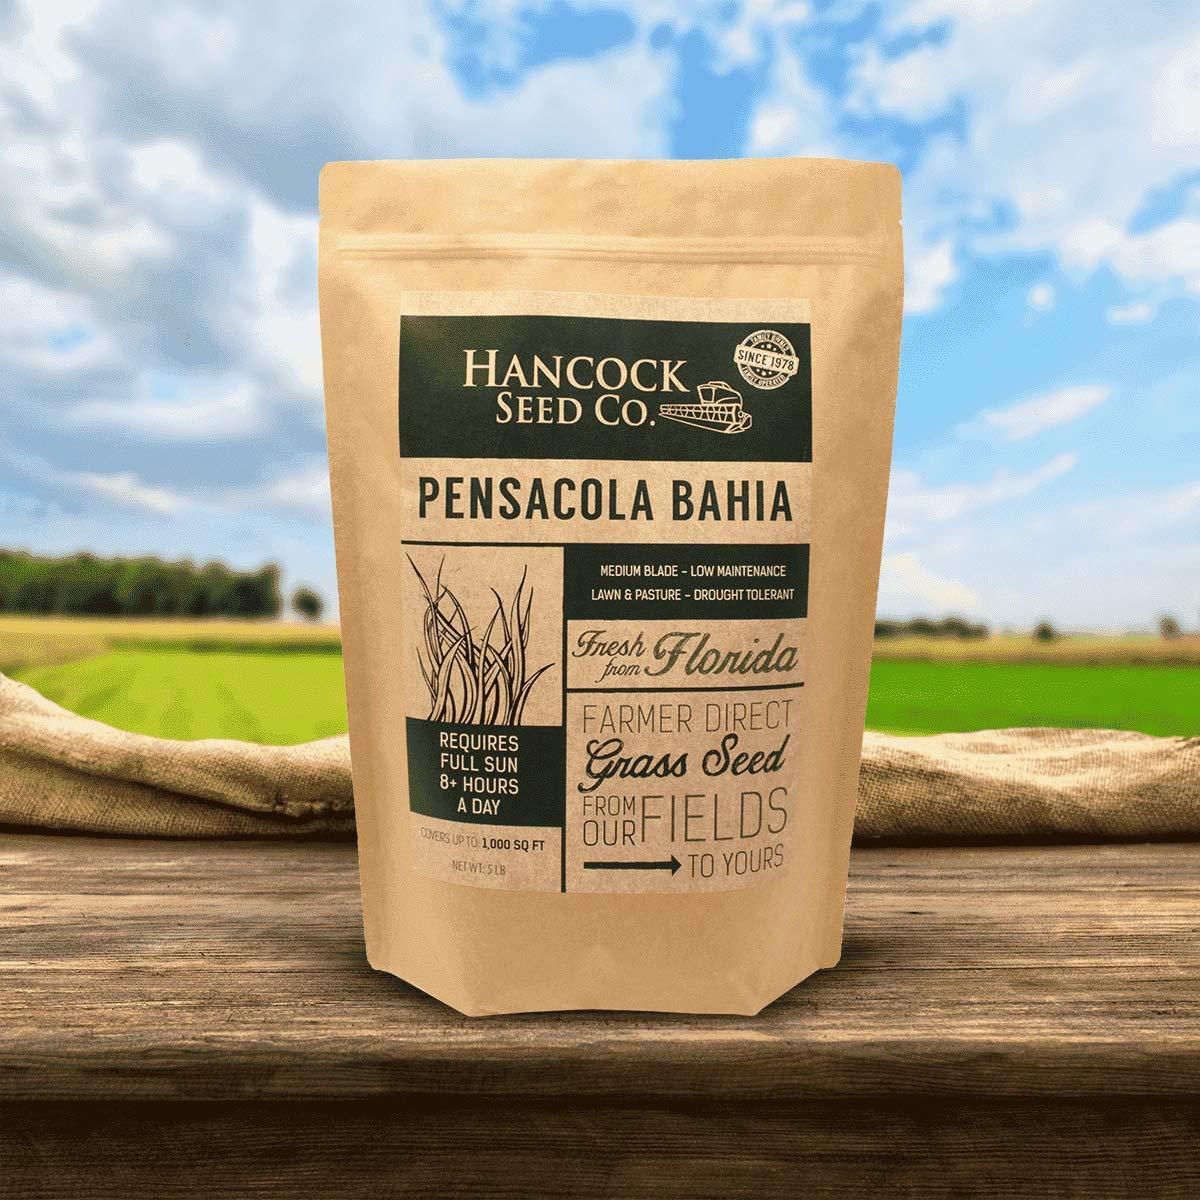 Hancock's Pensacola Bahia Grass Seed (Coated) by Hancock Seed Company